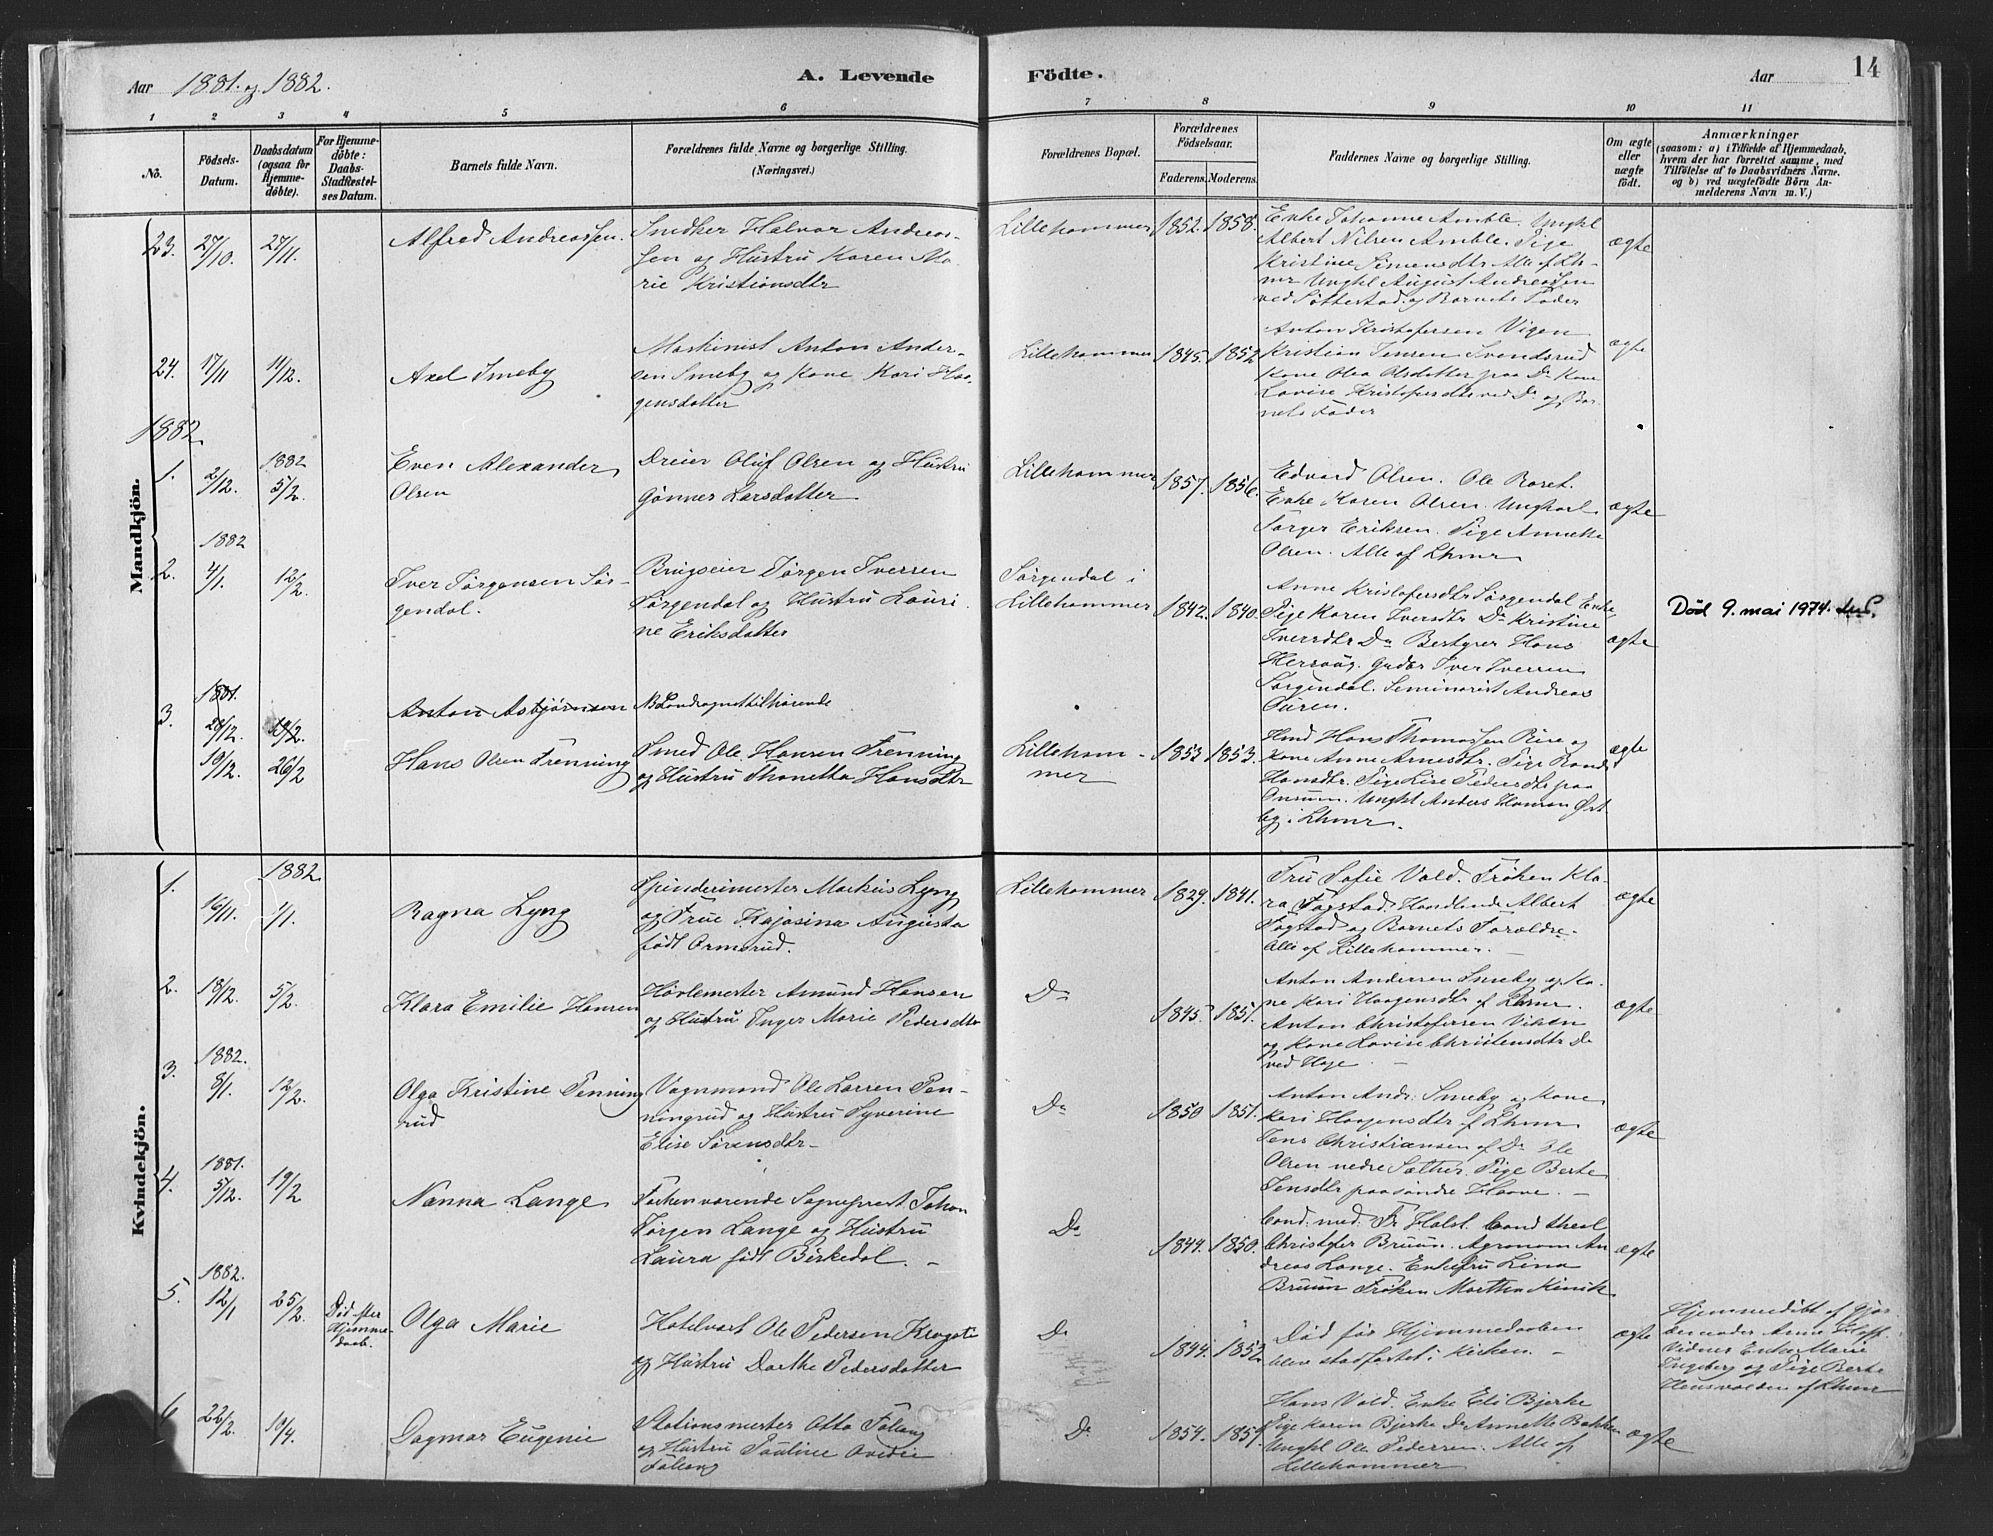 SAH, Fåberg prestekontor, Ministerialbok nr. 10, 1879-1900, s. 14